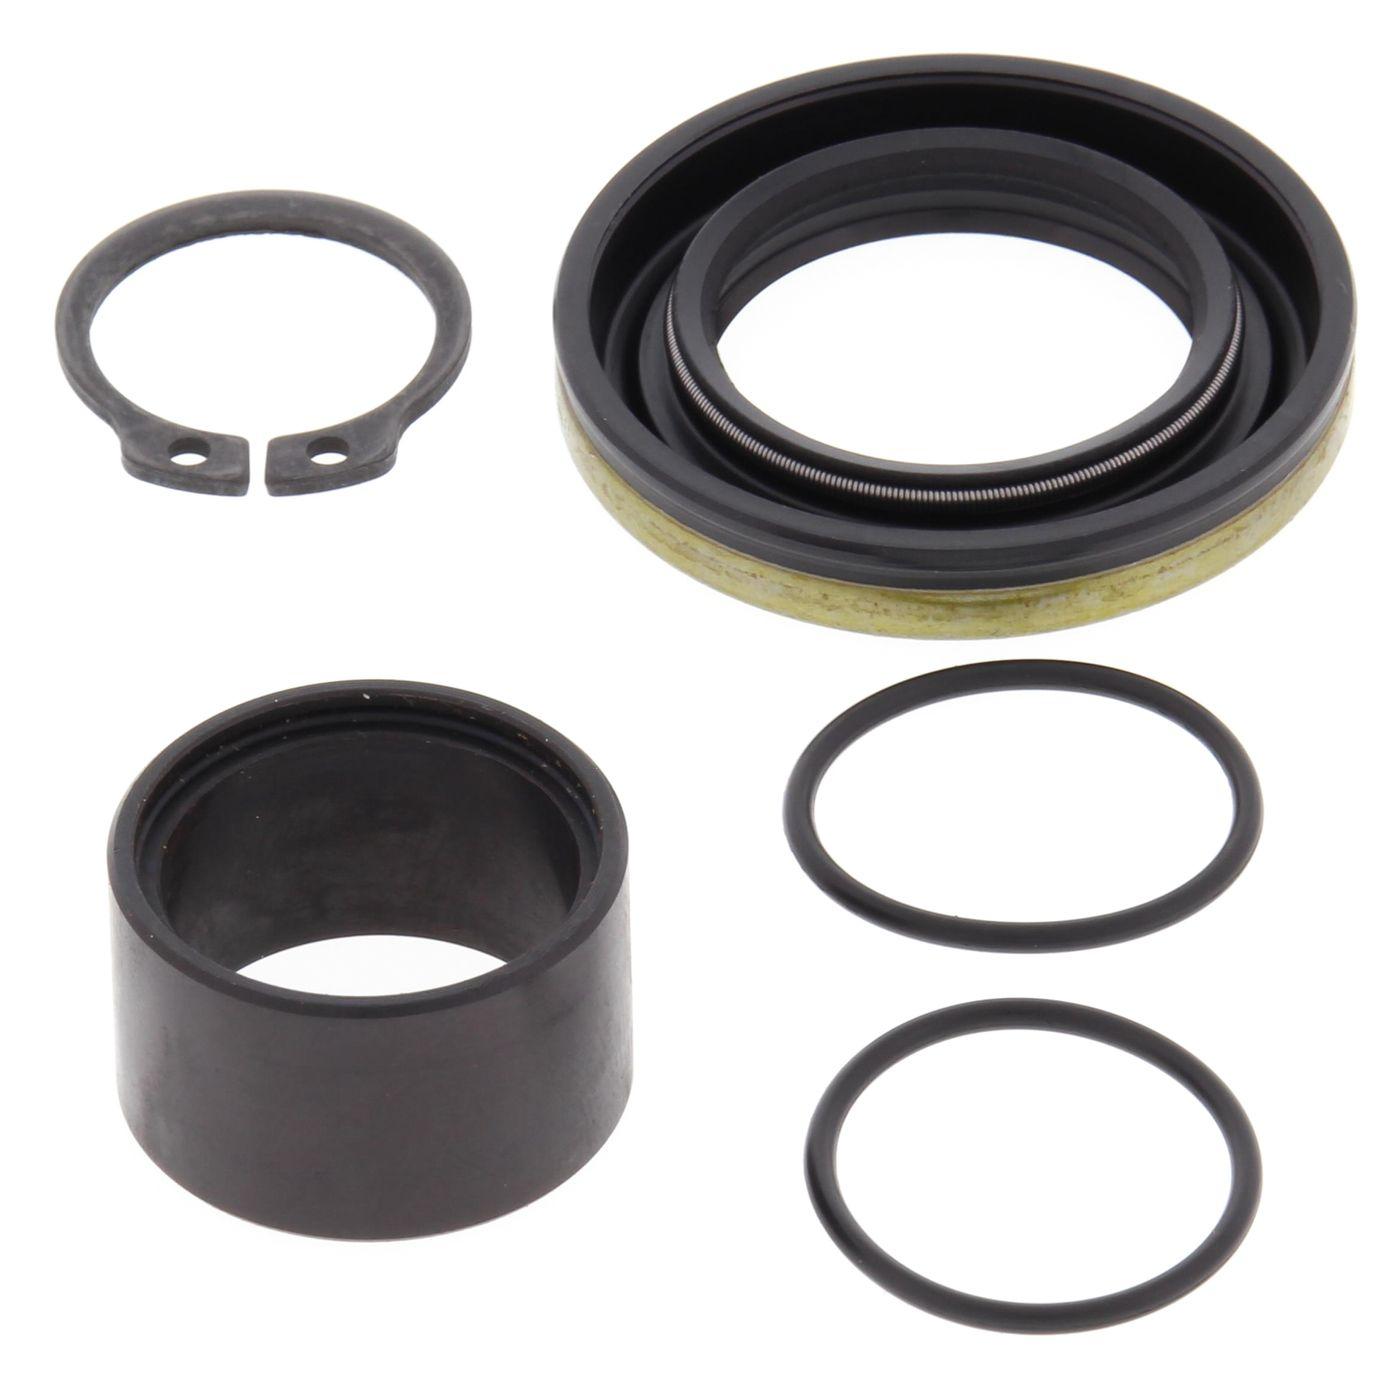 Wrp Drive Shaft Seal Kits - WRP254013 image